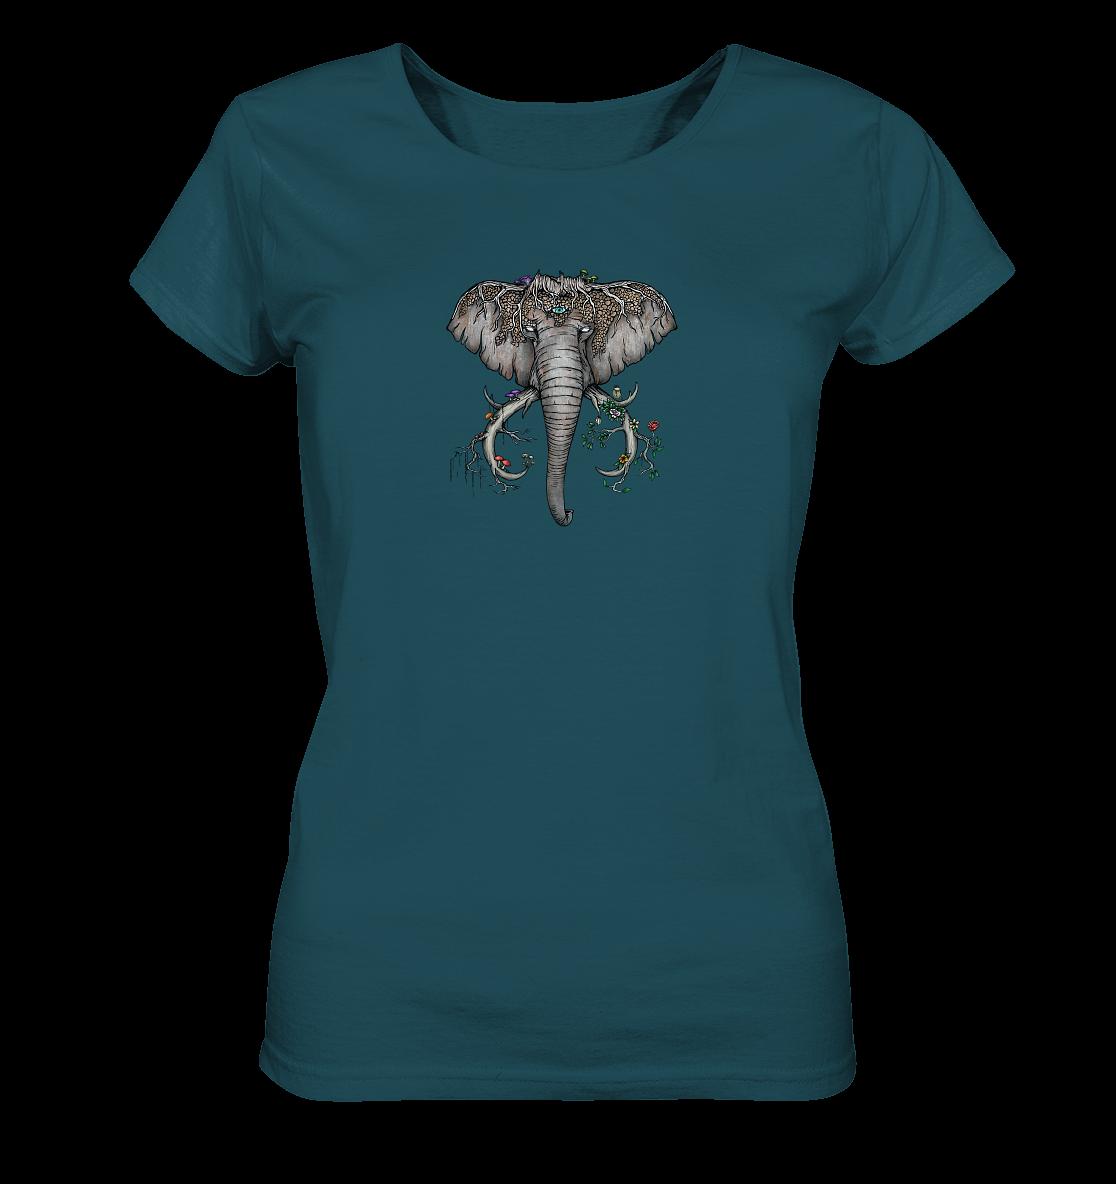 front-ladies-organic-shirt-204d59-1116x-1.png